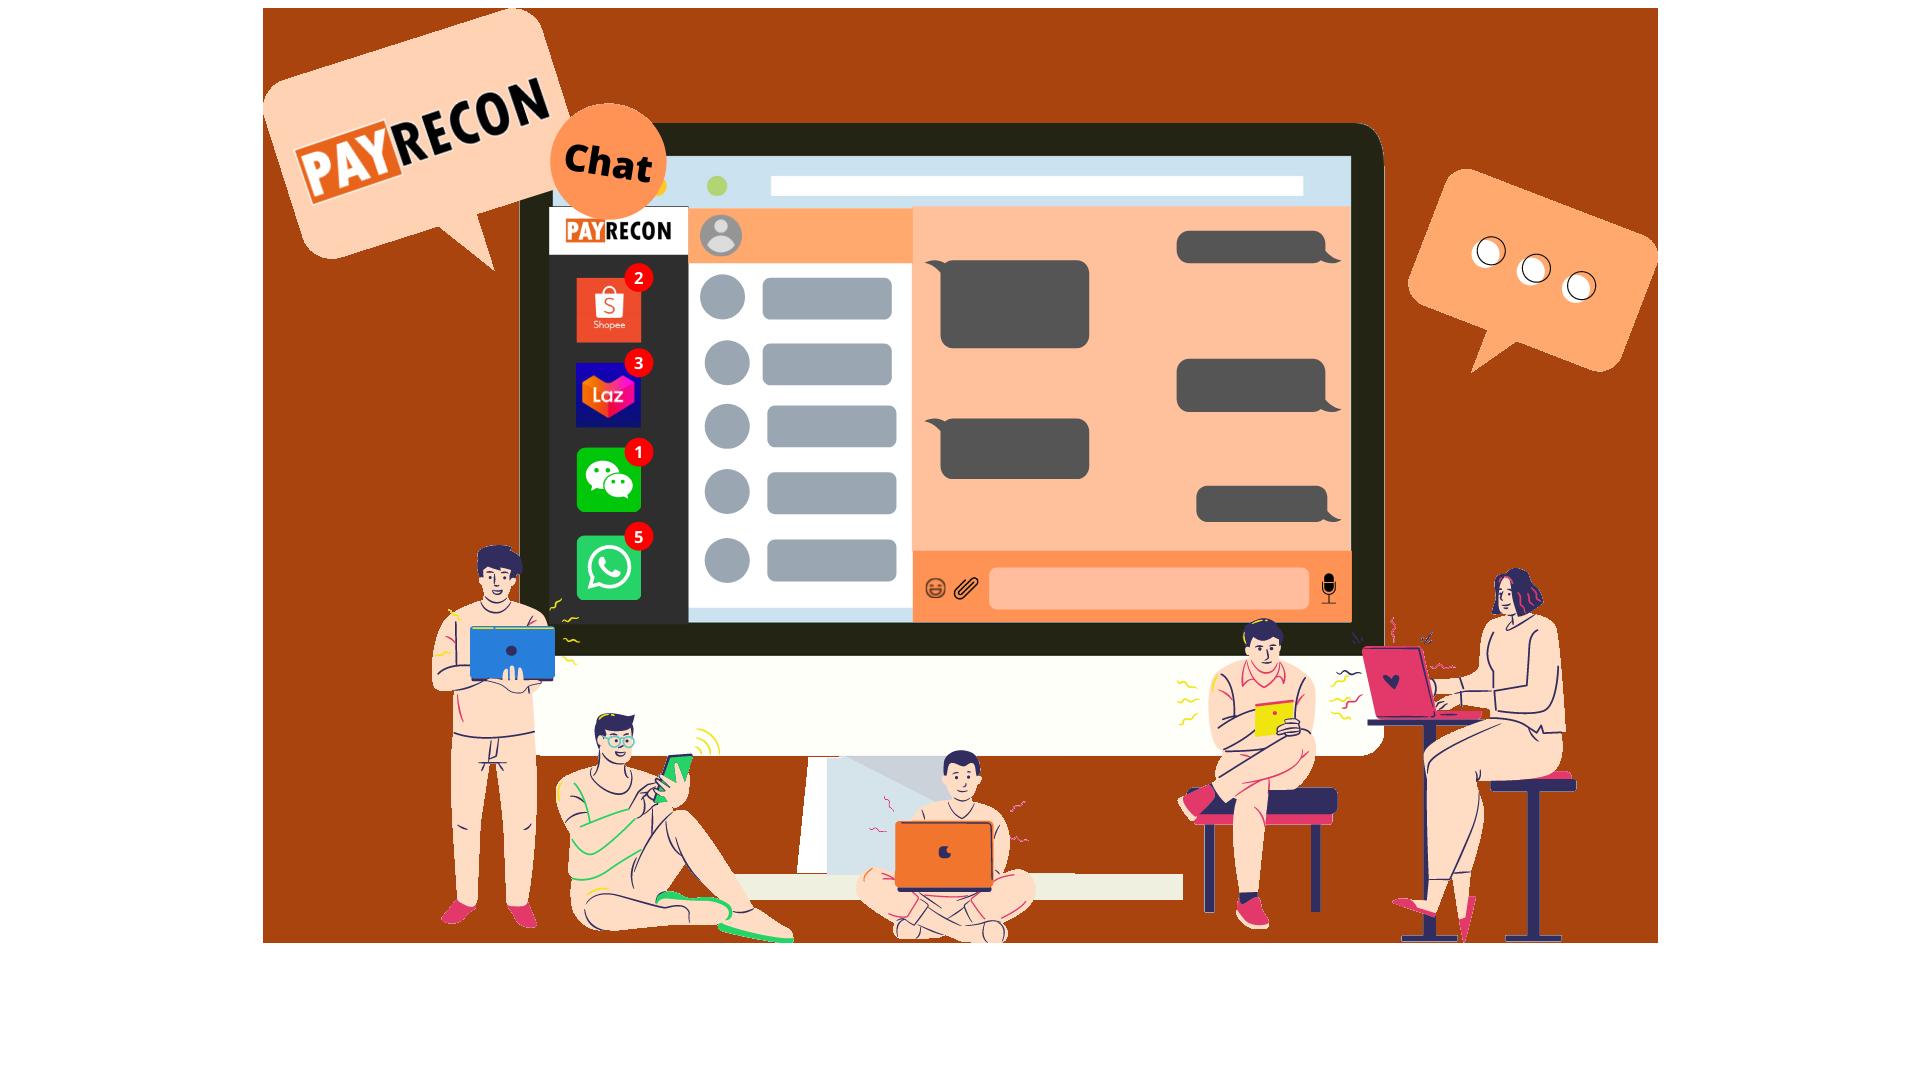 payrecon multichannel e-commerce chat system